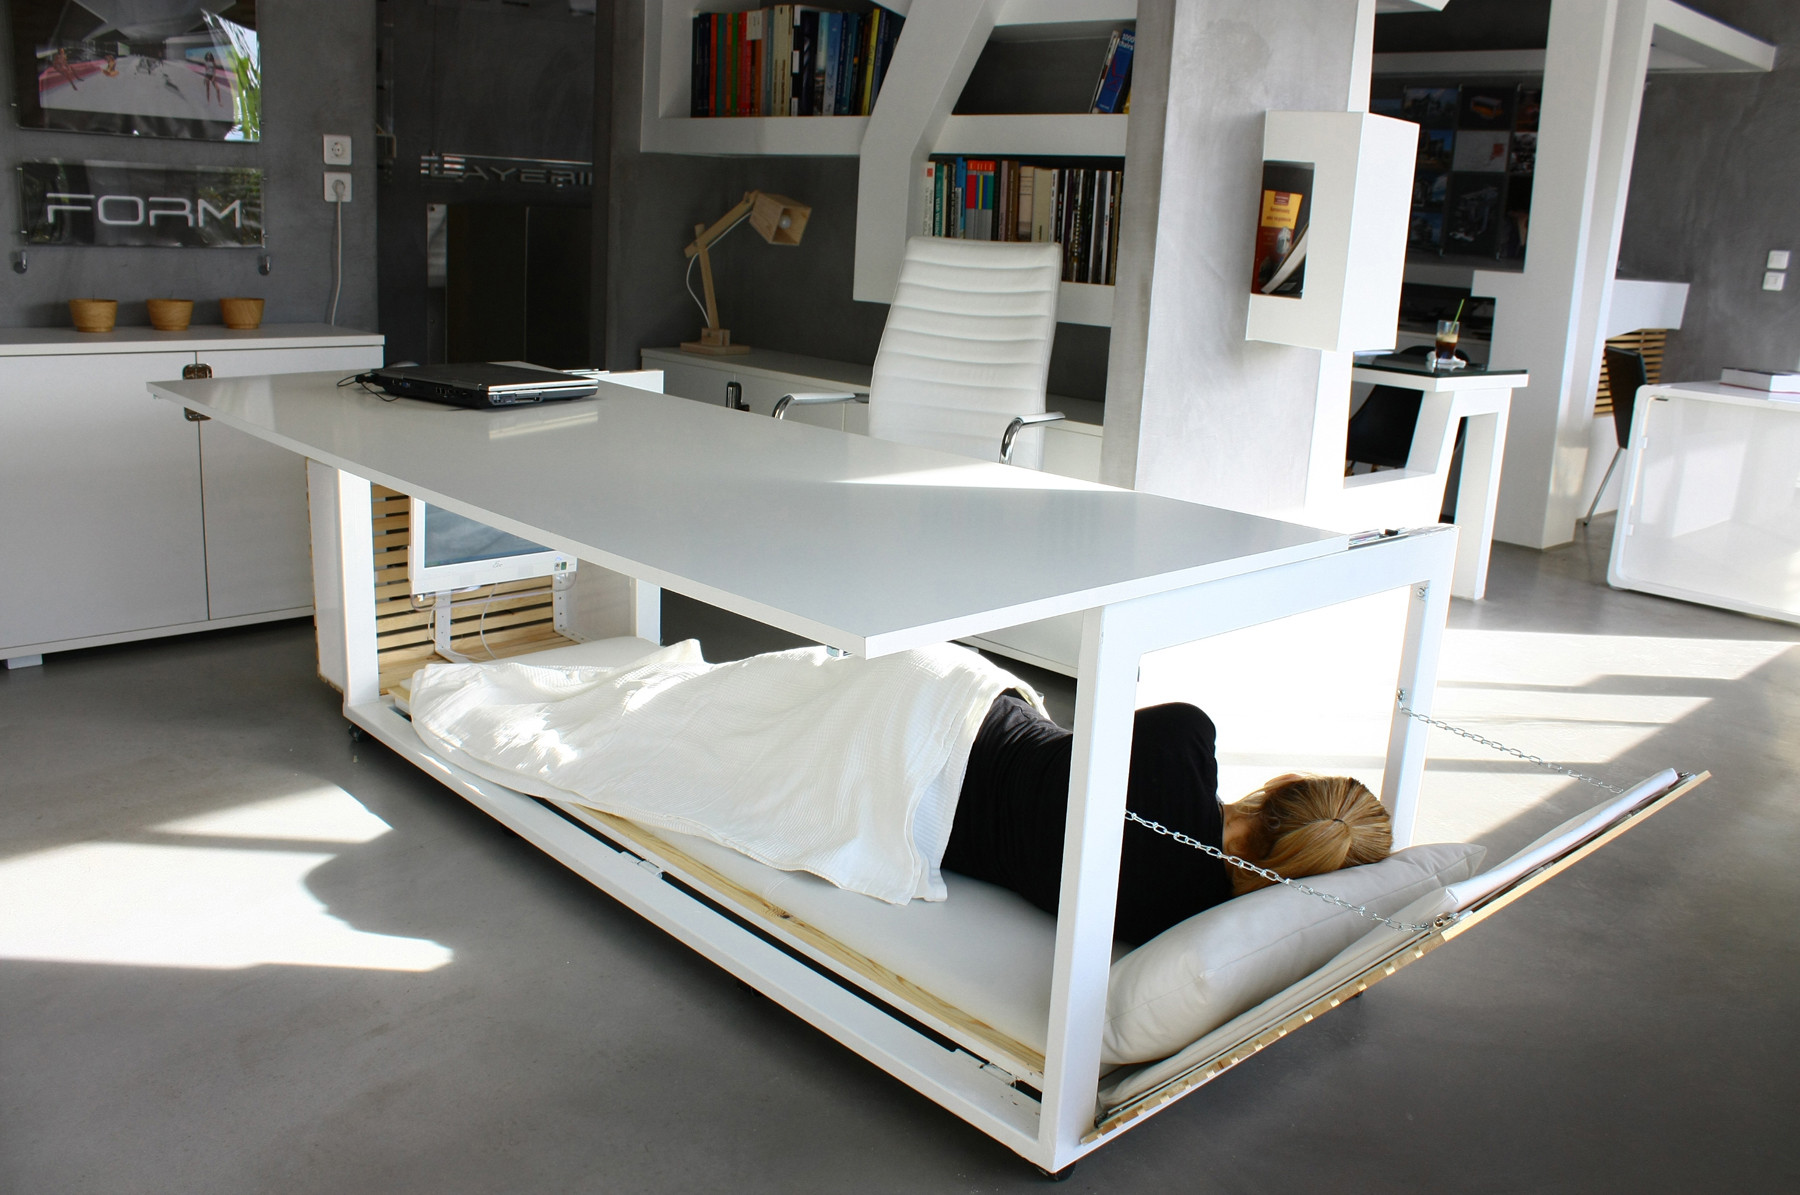 """1.6 m2 de vida"": Studio NL diseña un escritorio que se transforma en un dormitorio compacto, © Athanasia Leivaditou"